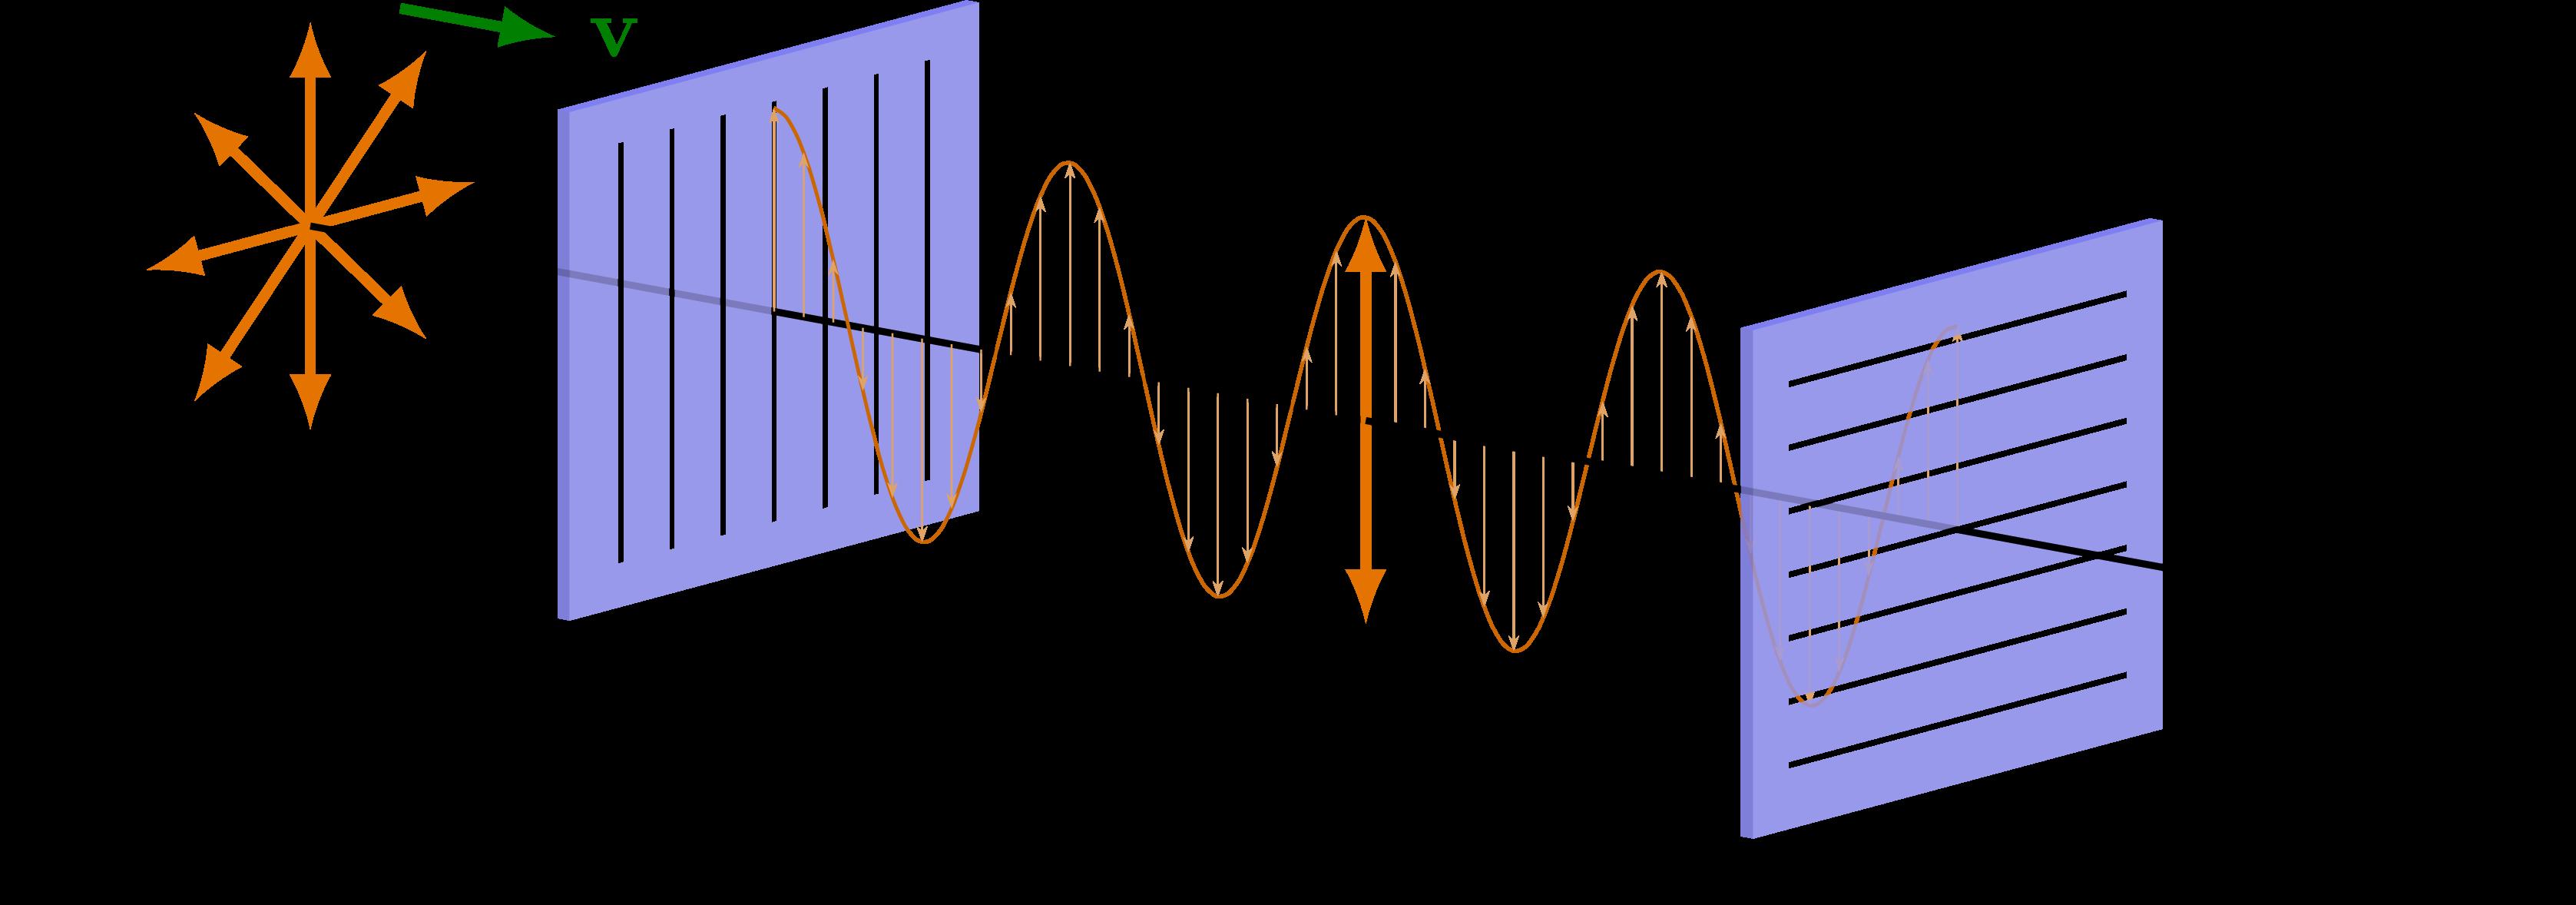 optics_polarization-002.png